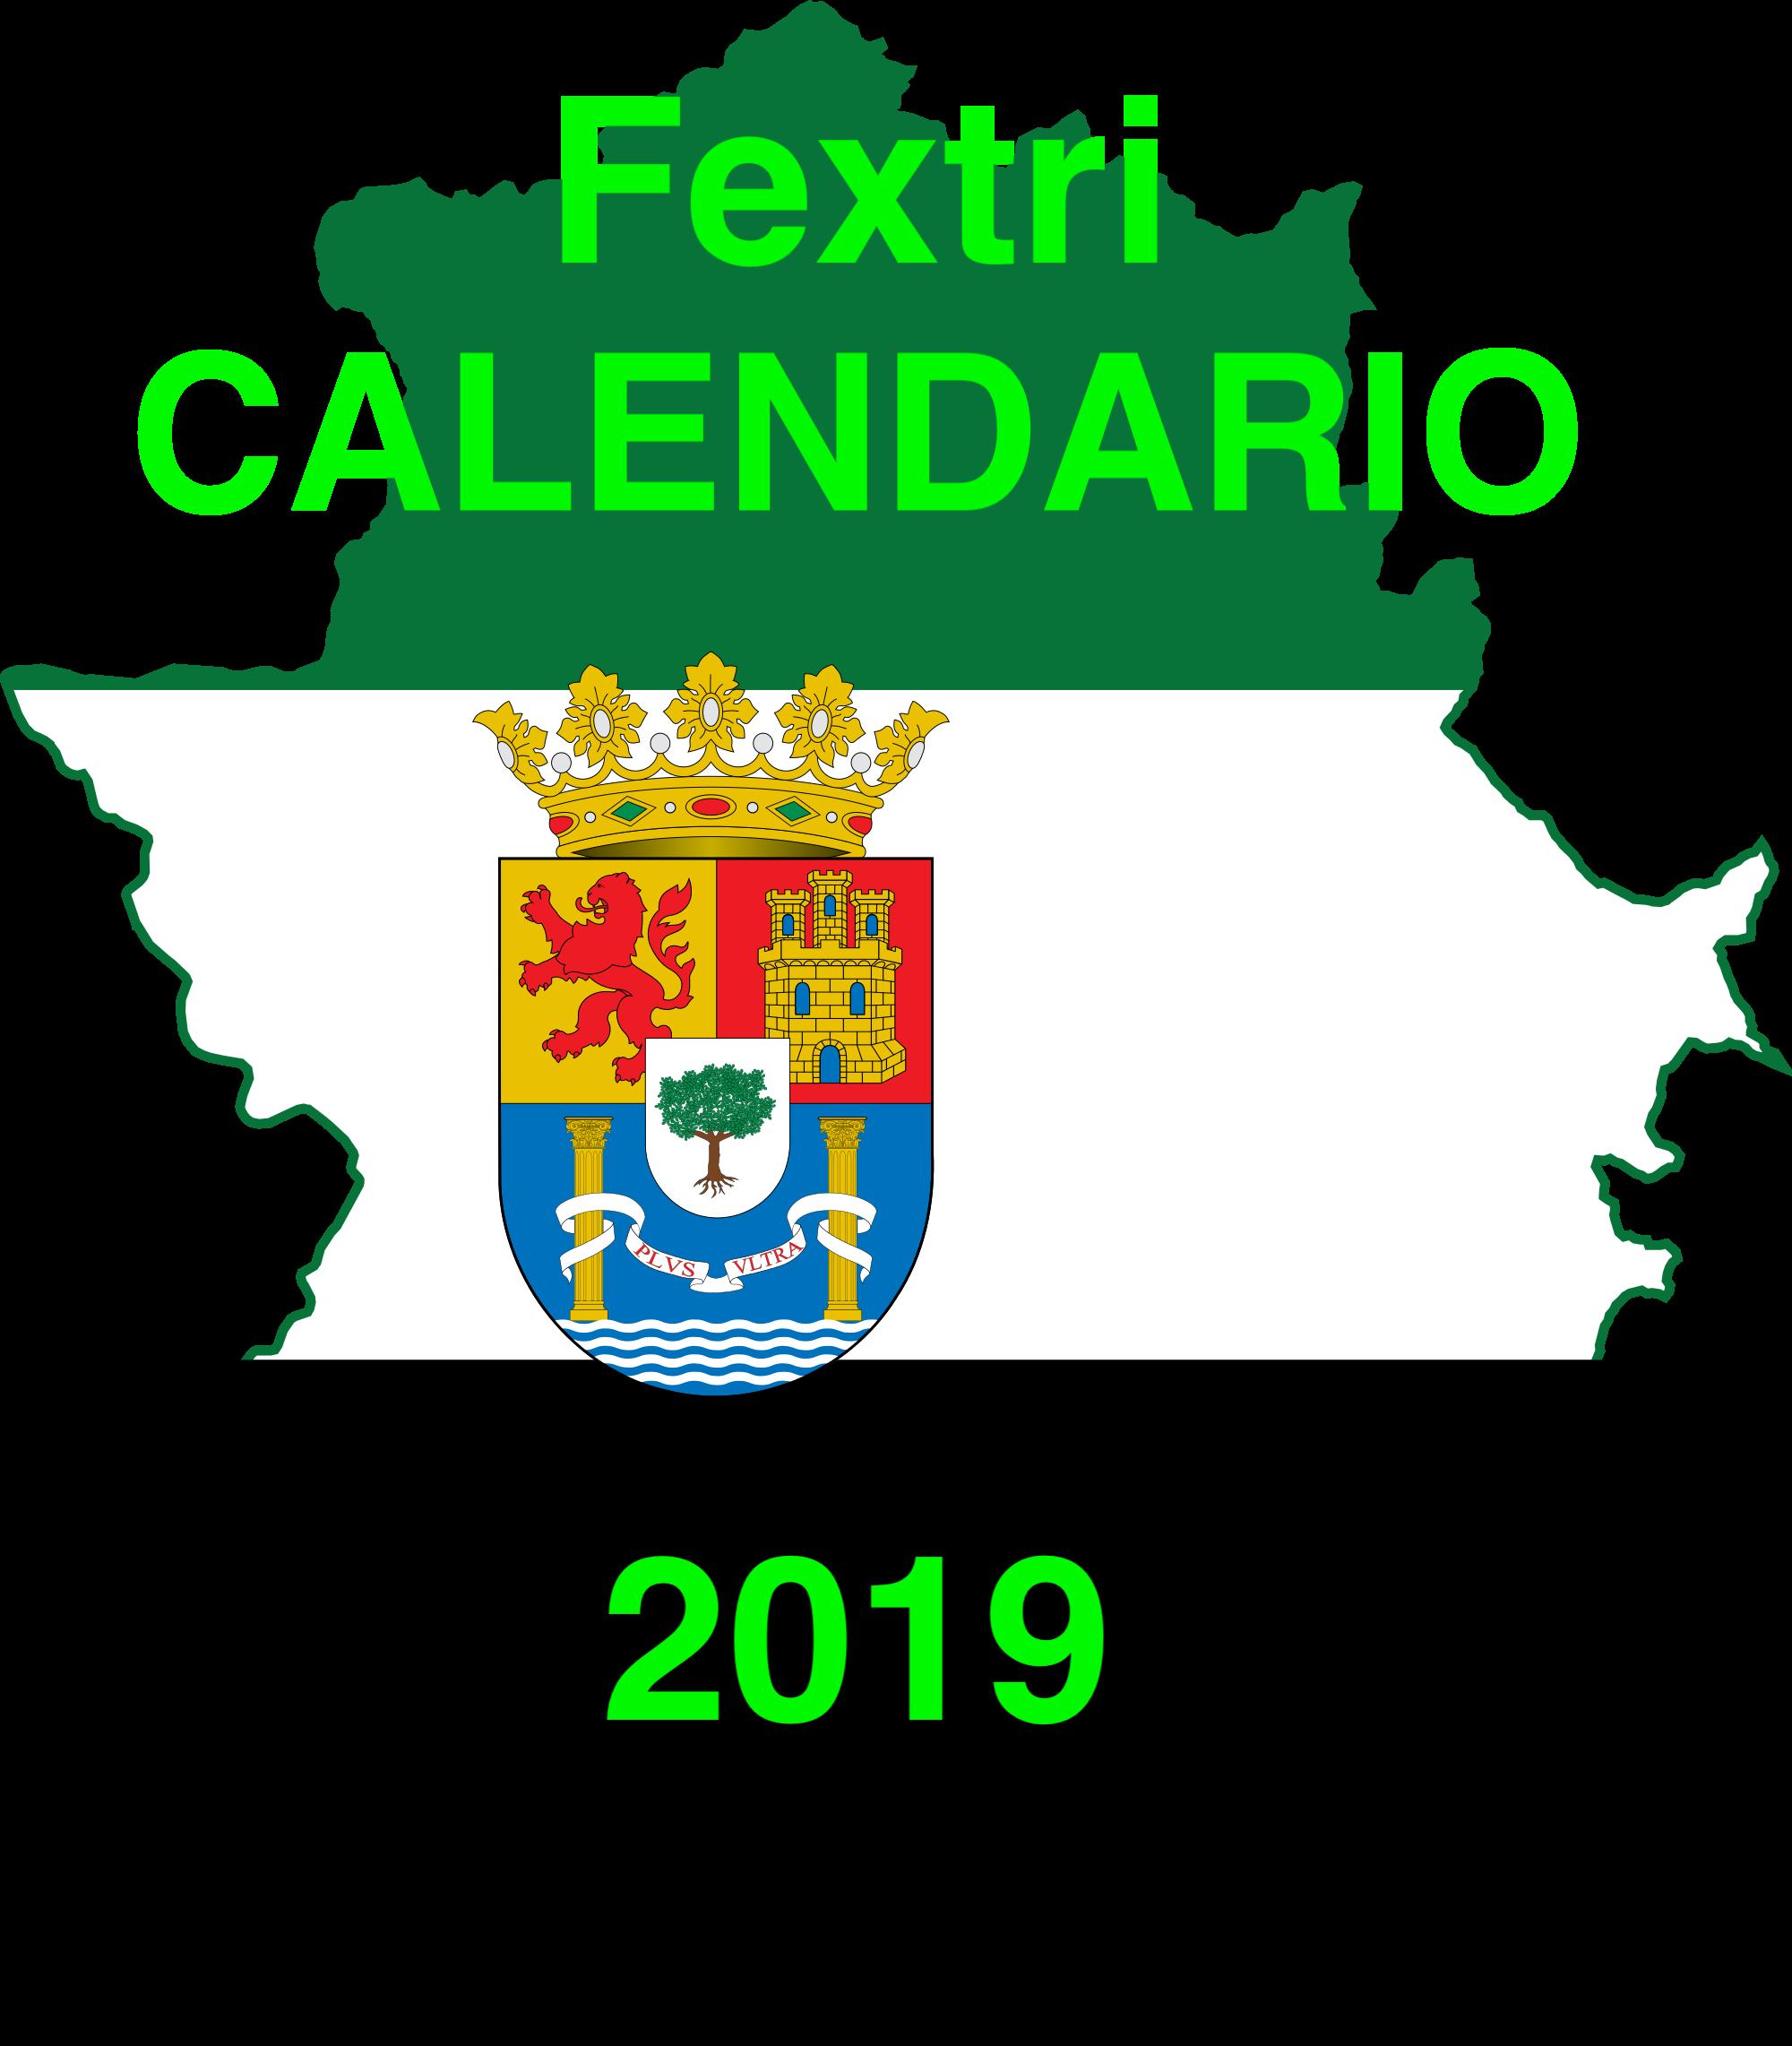 Calendario Fextri 2019